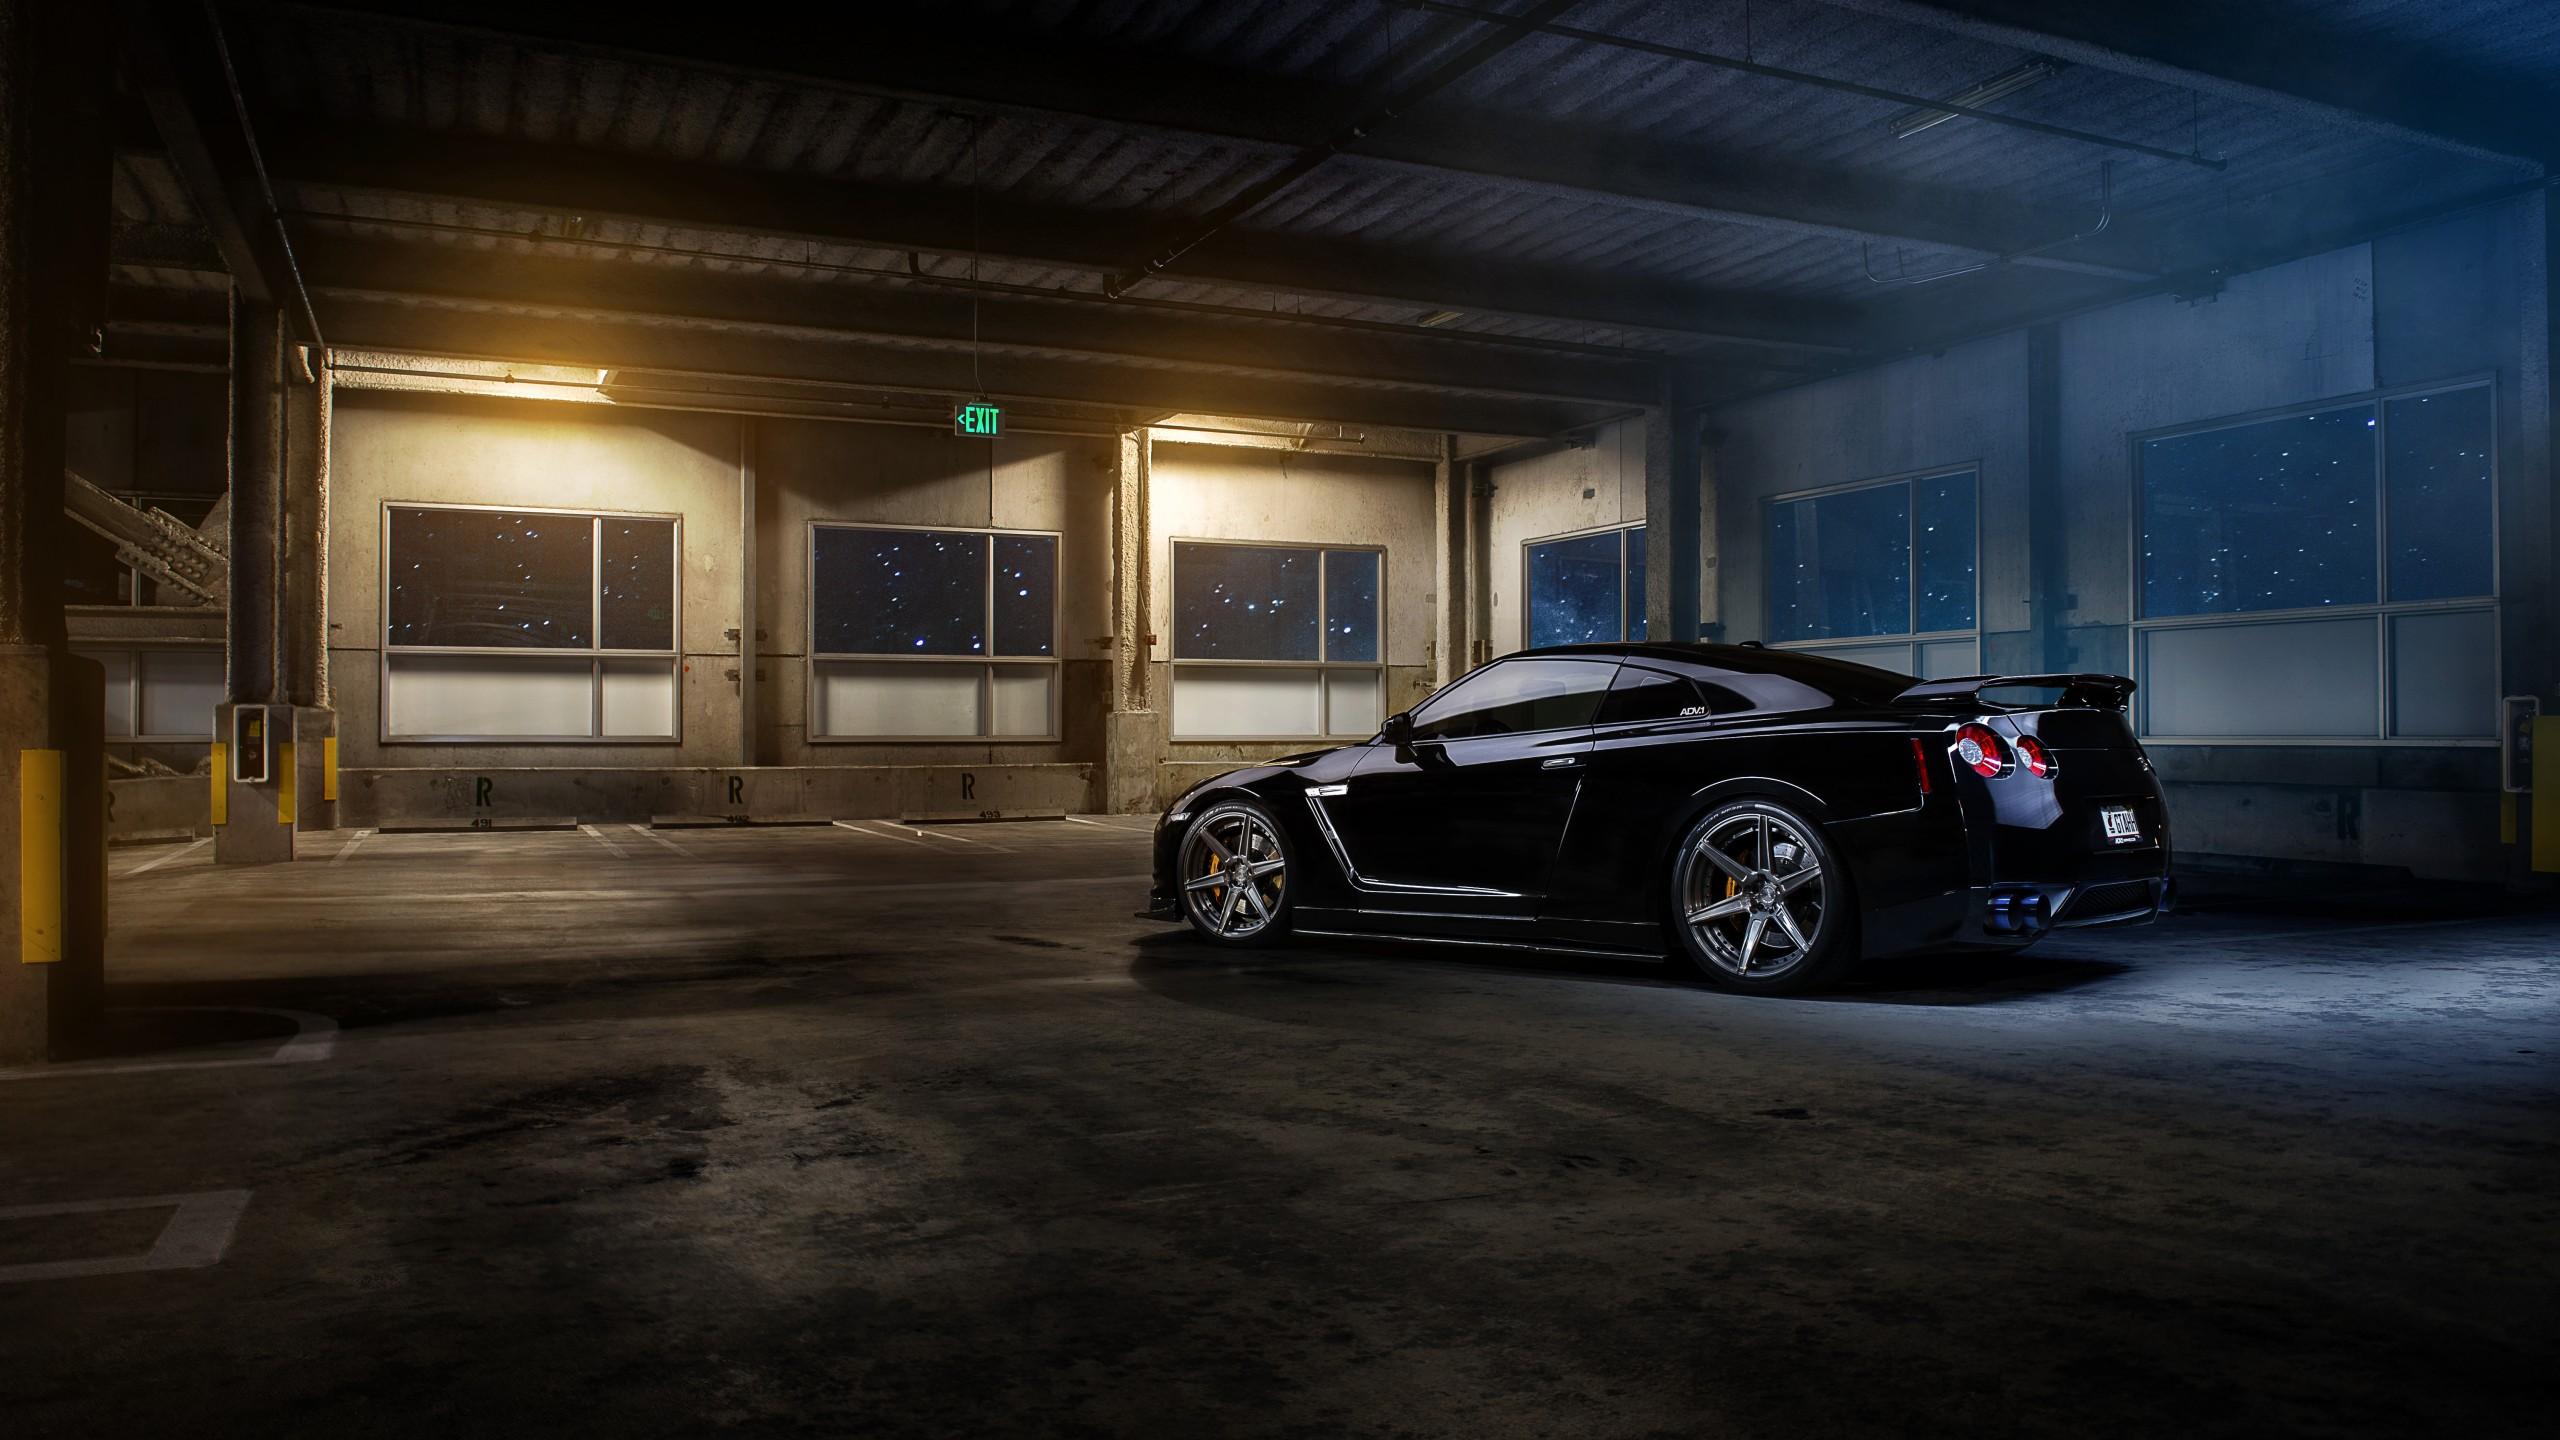 Nissan Luxury Brand >> Wallpaper Nissan GT-R Premium, 2018 Cars, luxury cars, 6K, Cars & Bikes #19898